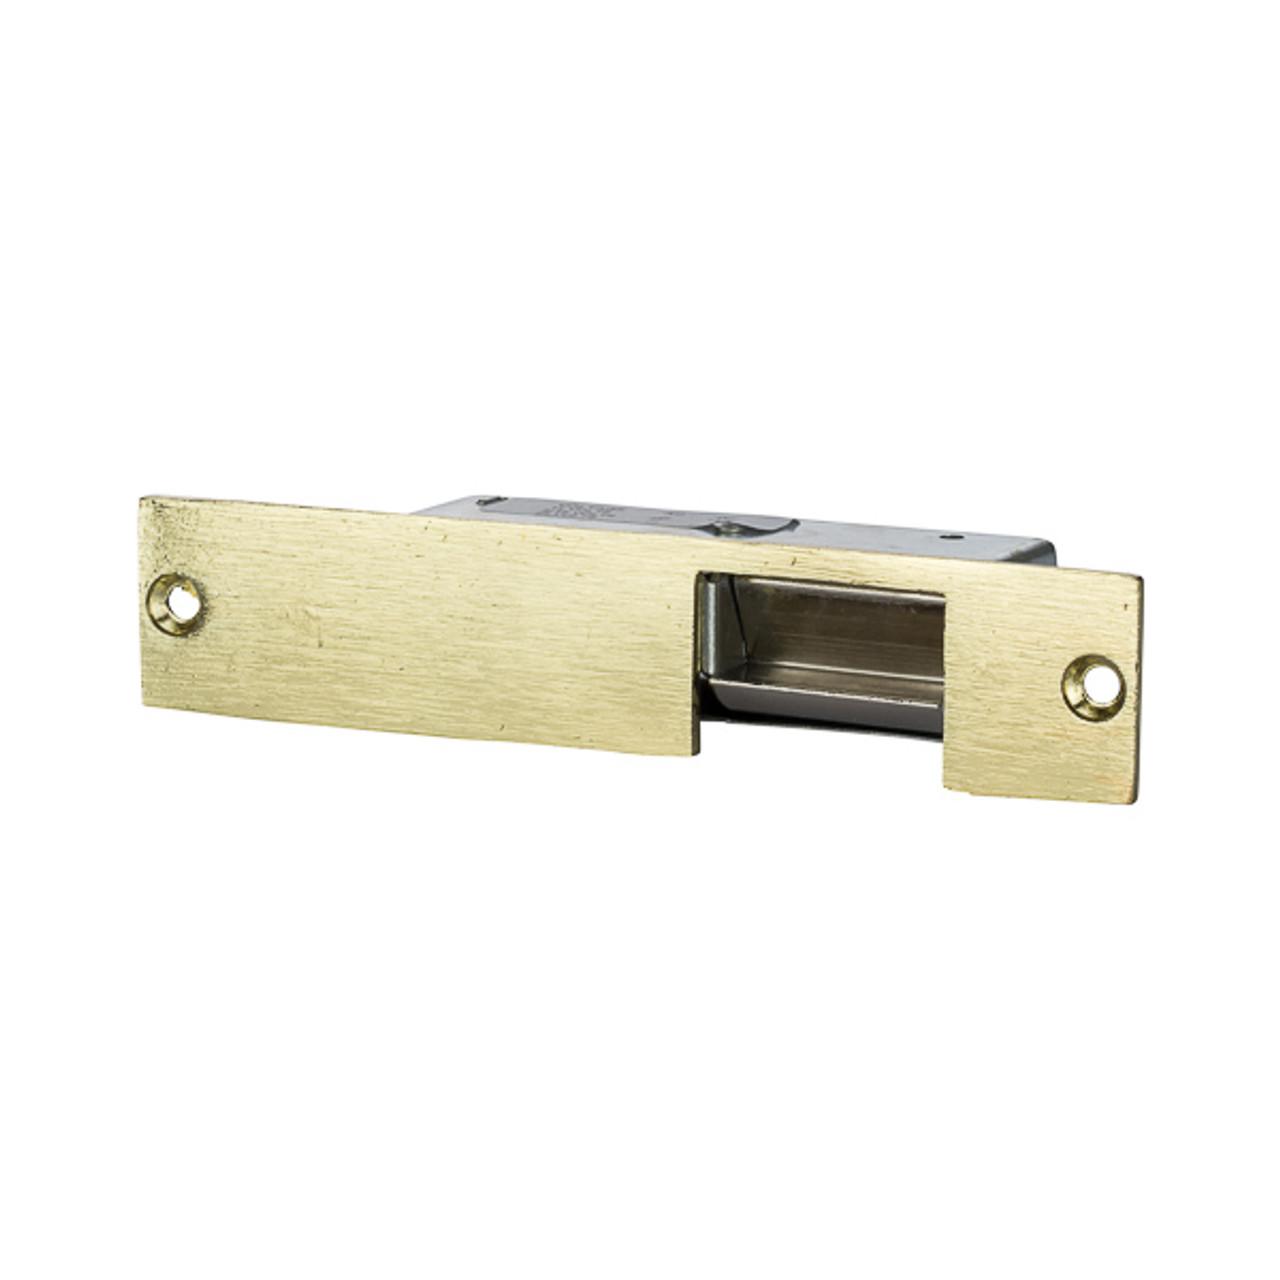 Tork TA09 Mortise Type Remote Control Electric Door Opener